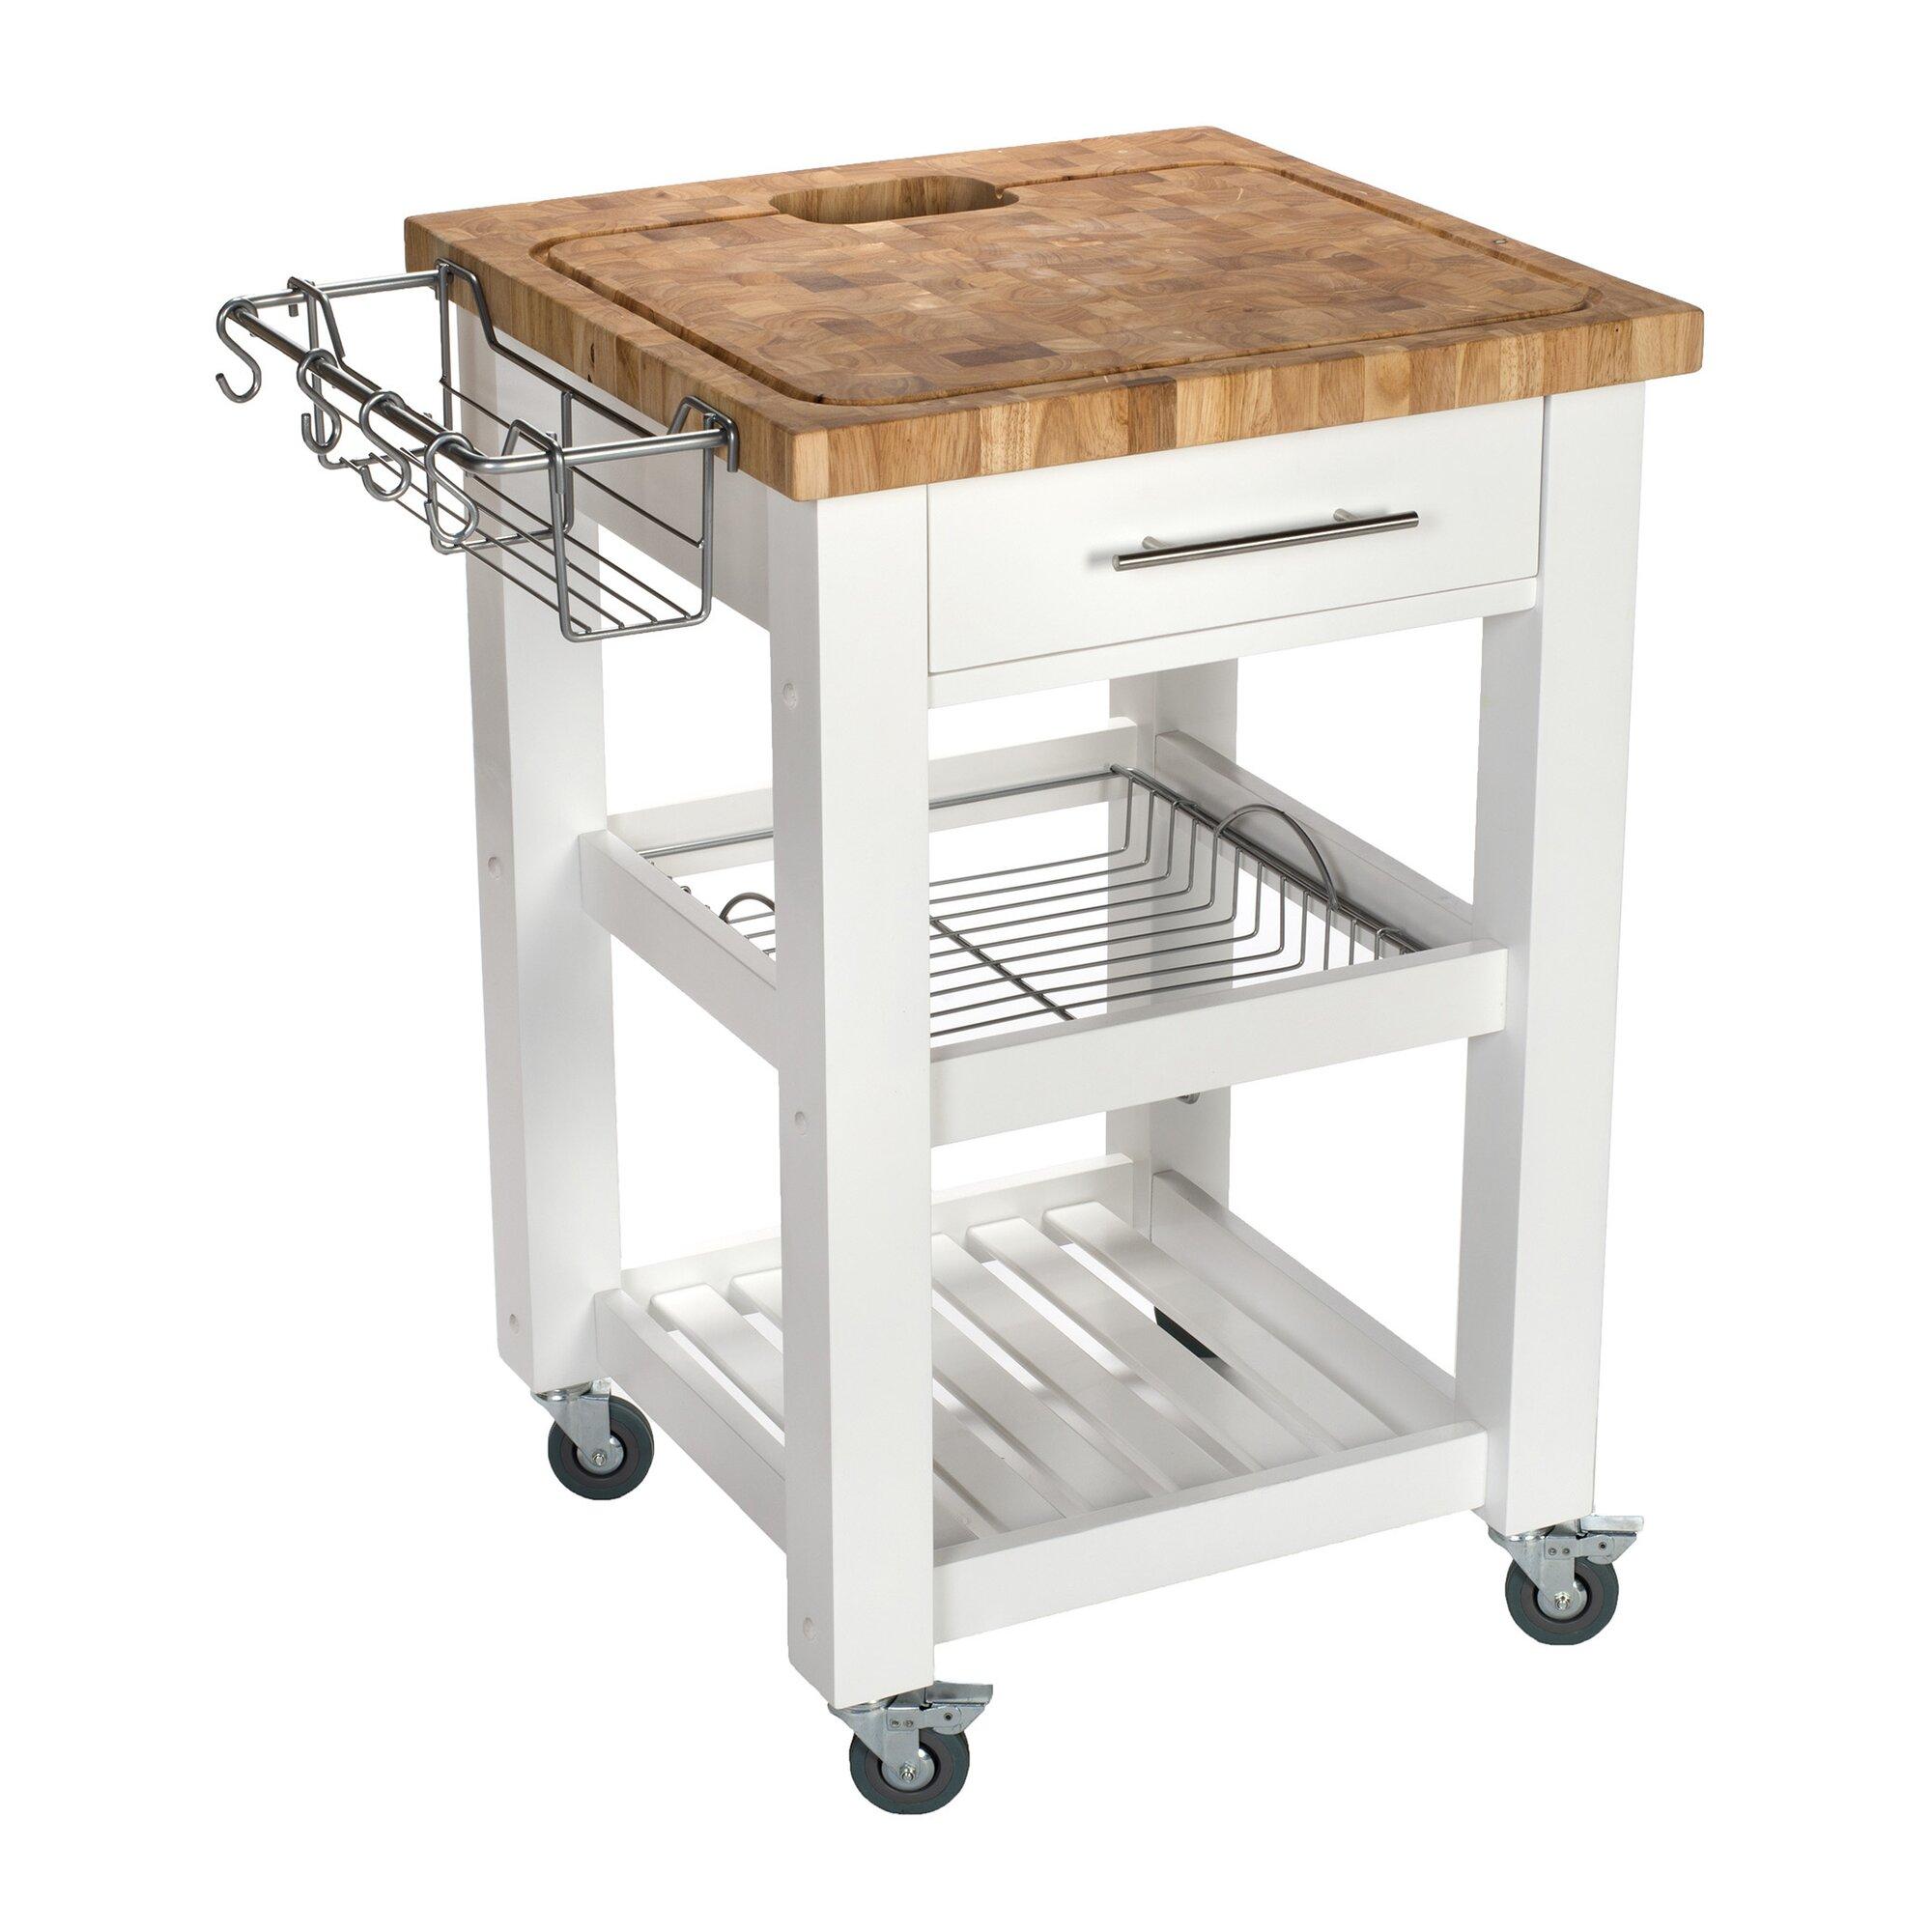 World Market Furniture Reviews: Chris & Chris Pro Chef Kitchen Cart With Butcher Block Top